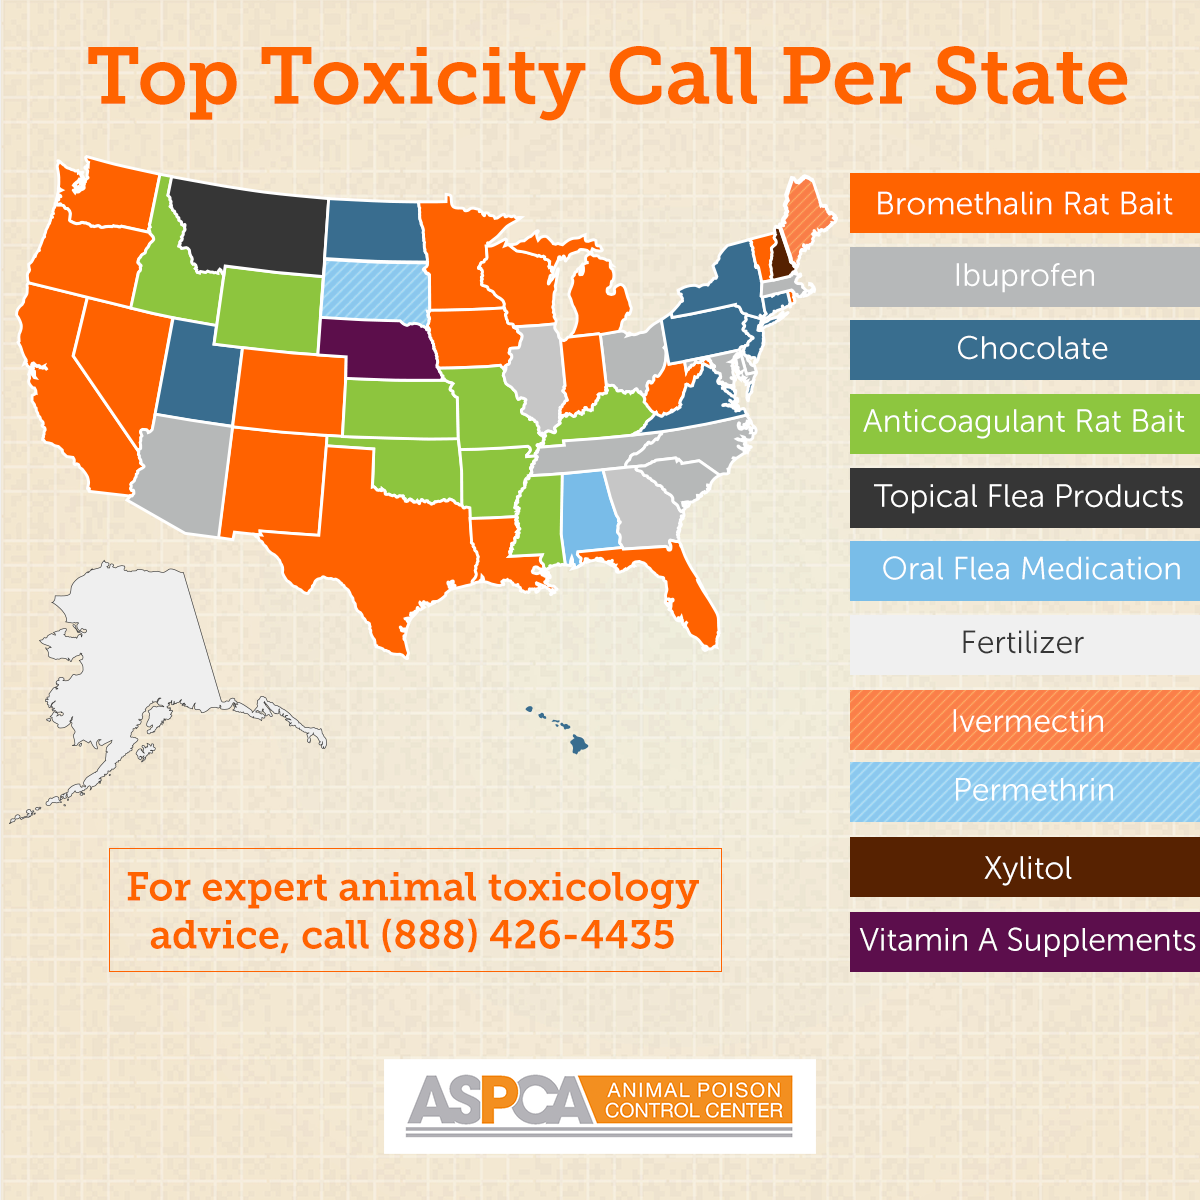 top toxicity calls per state